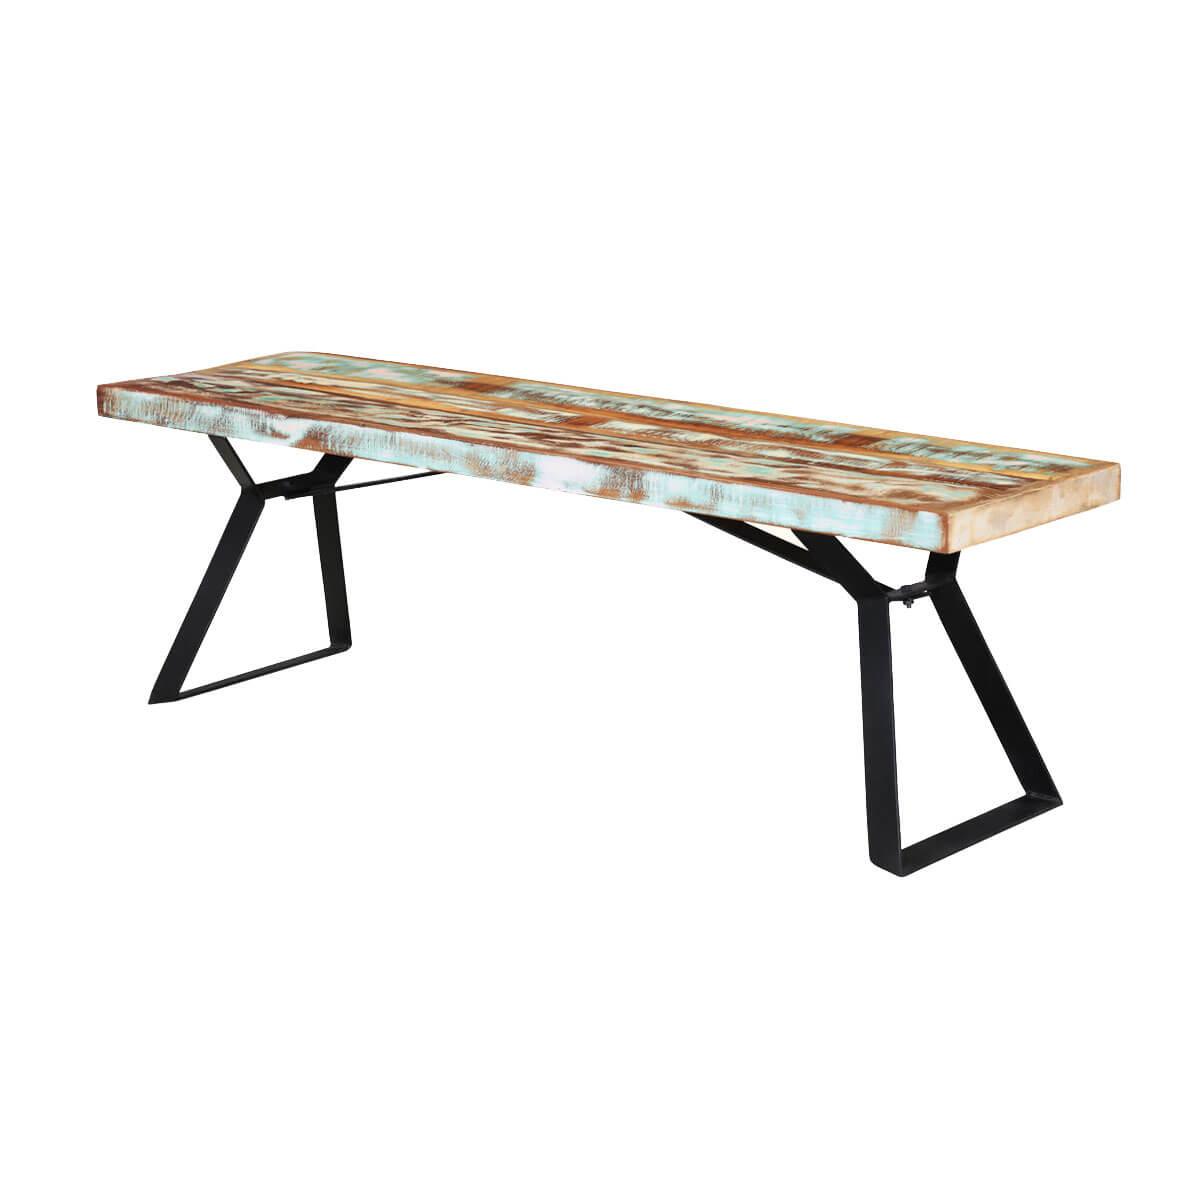 Pleasing Rainbow 59 Handcrafted Reclaimed Wood Industrial Dining Bench Spiritservingveterans Wood Chair Design Ideas Spiritservingveteransorg